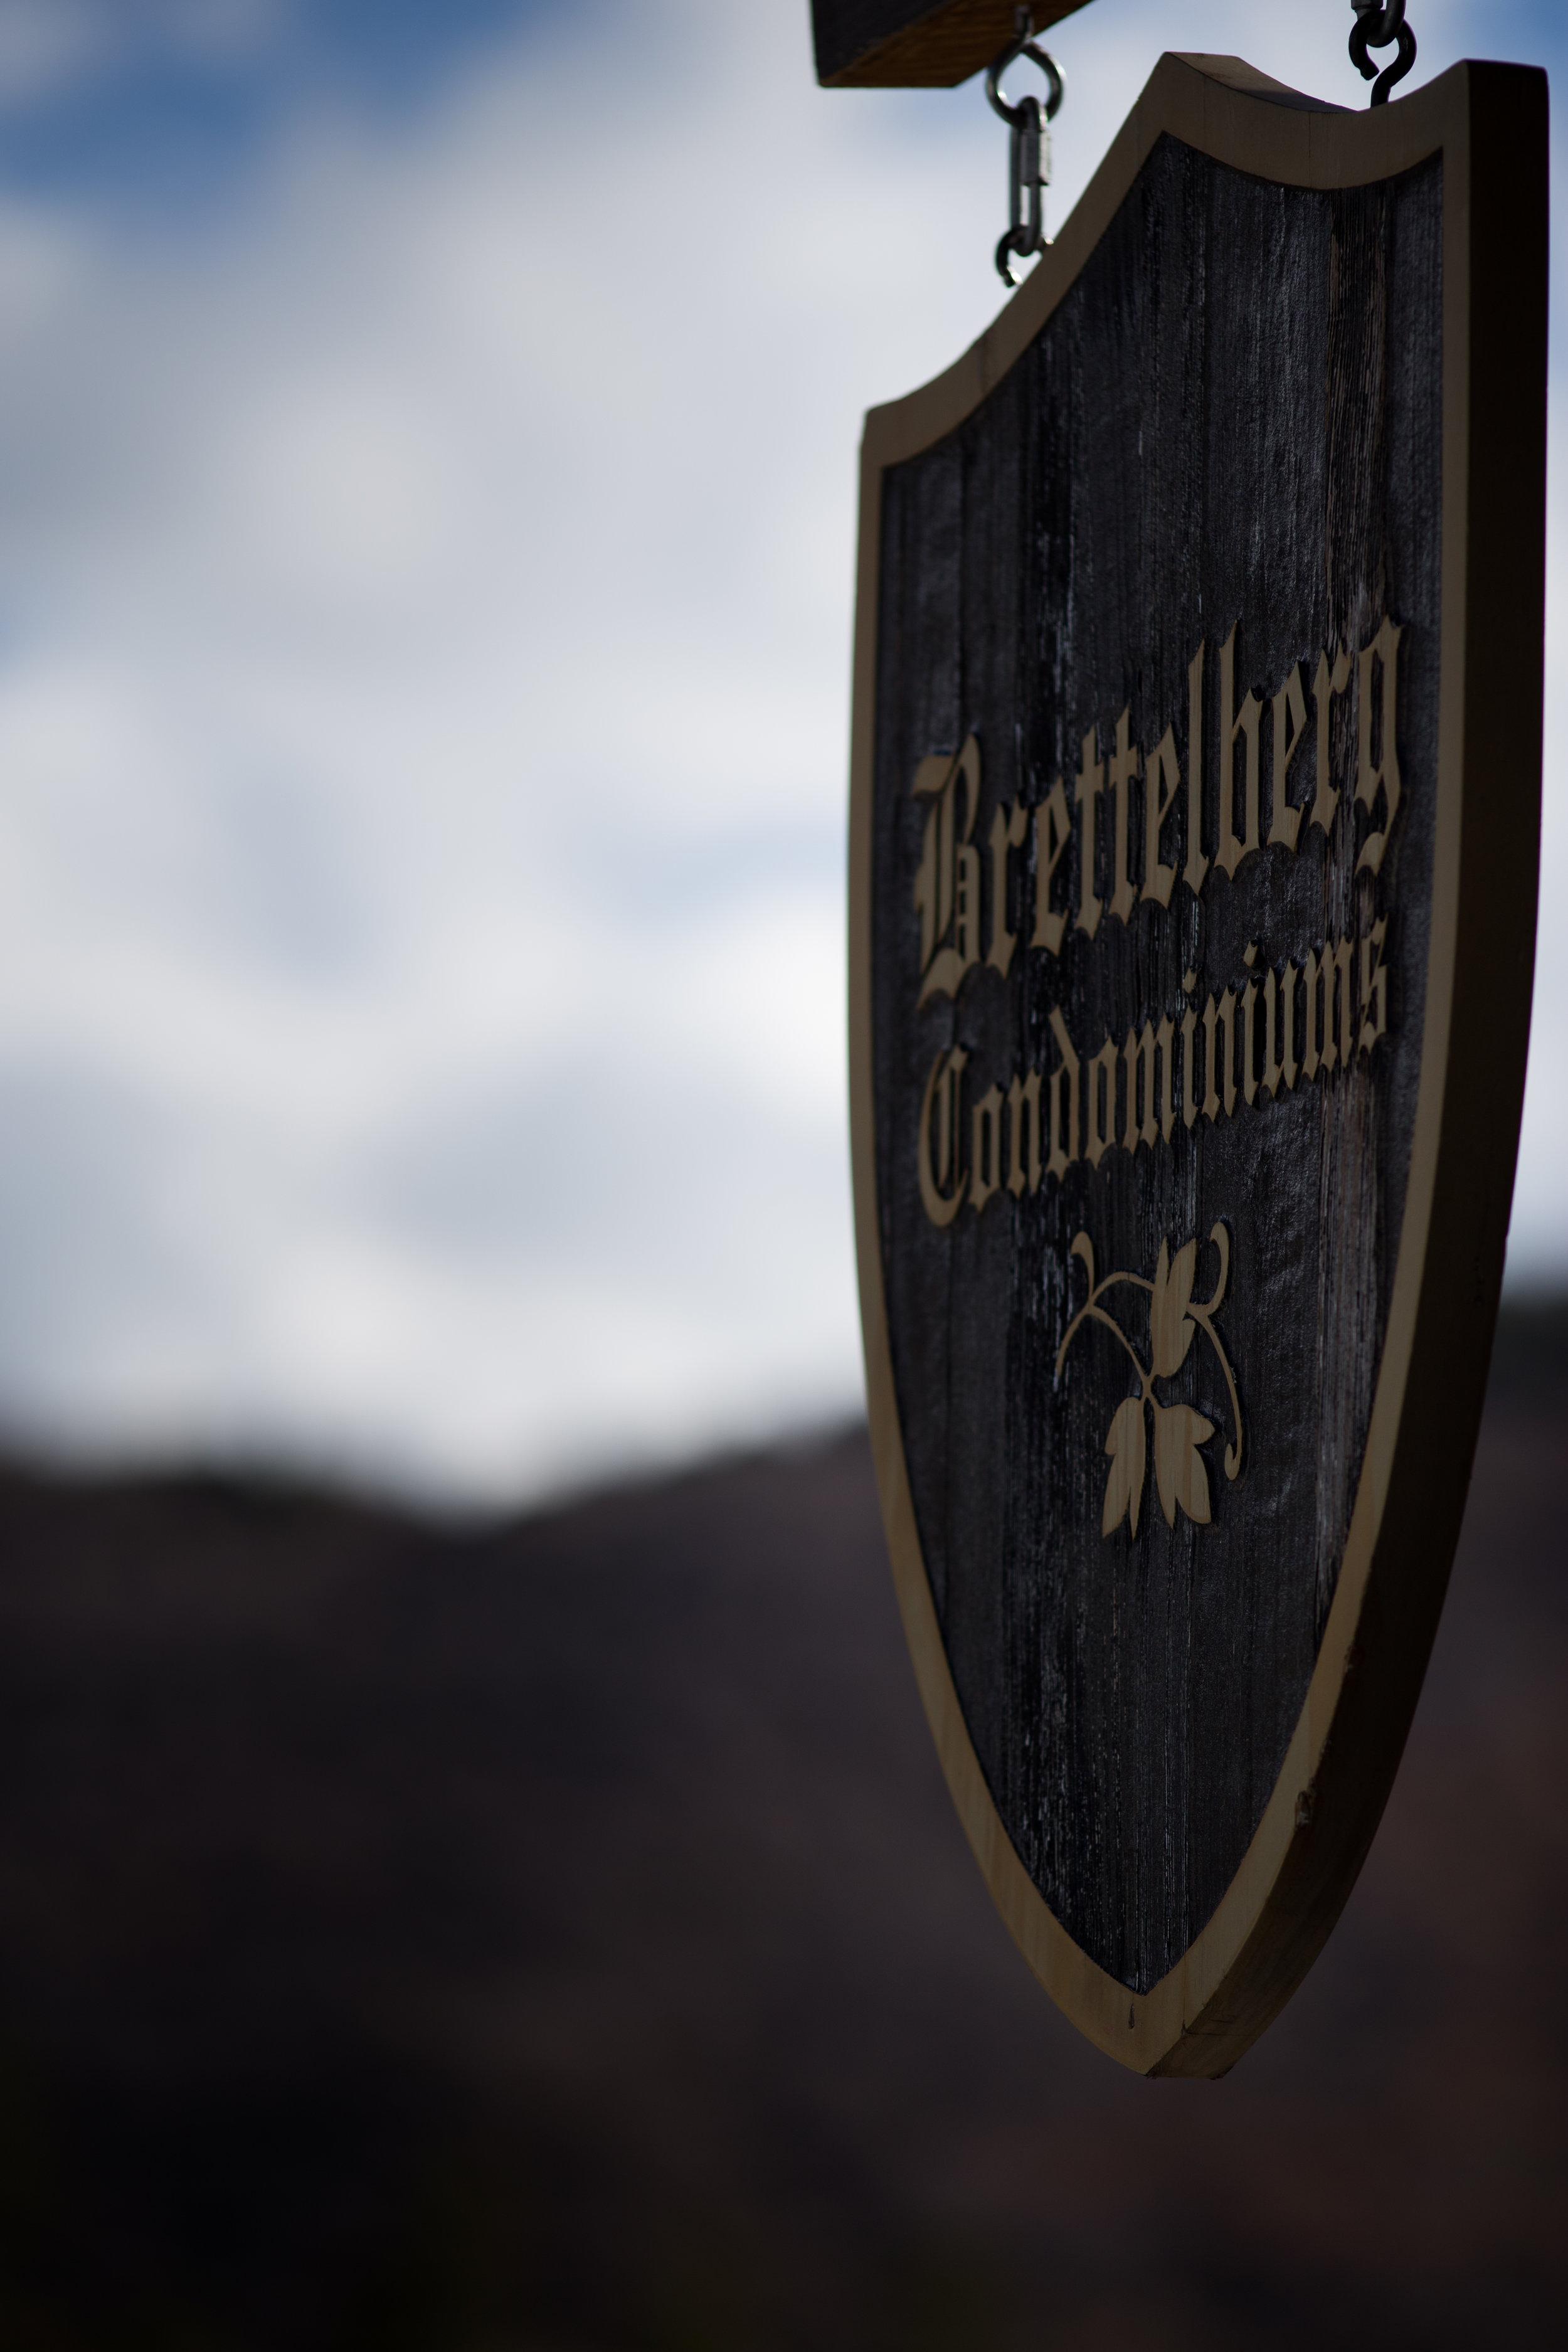 Brettelberg Sign.jpg